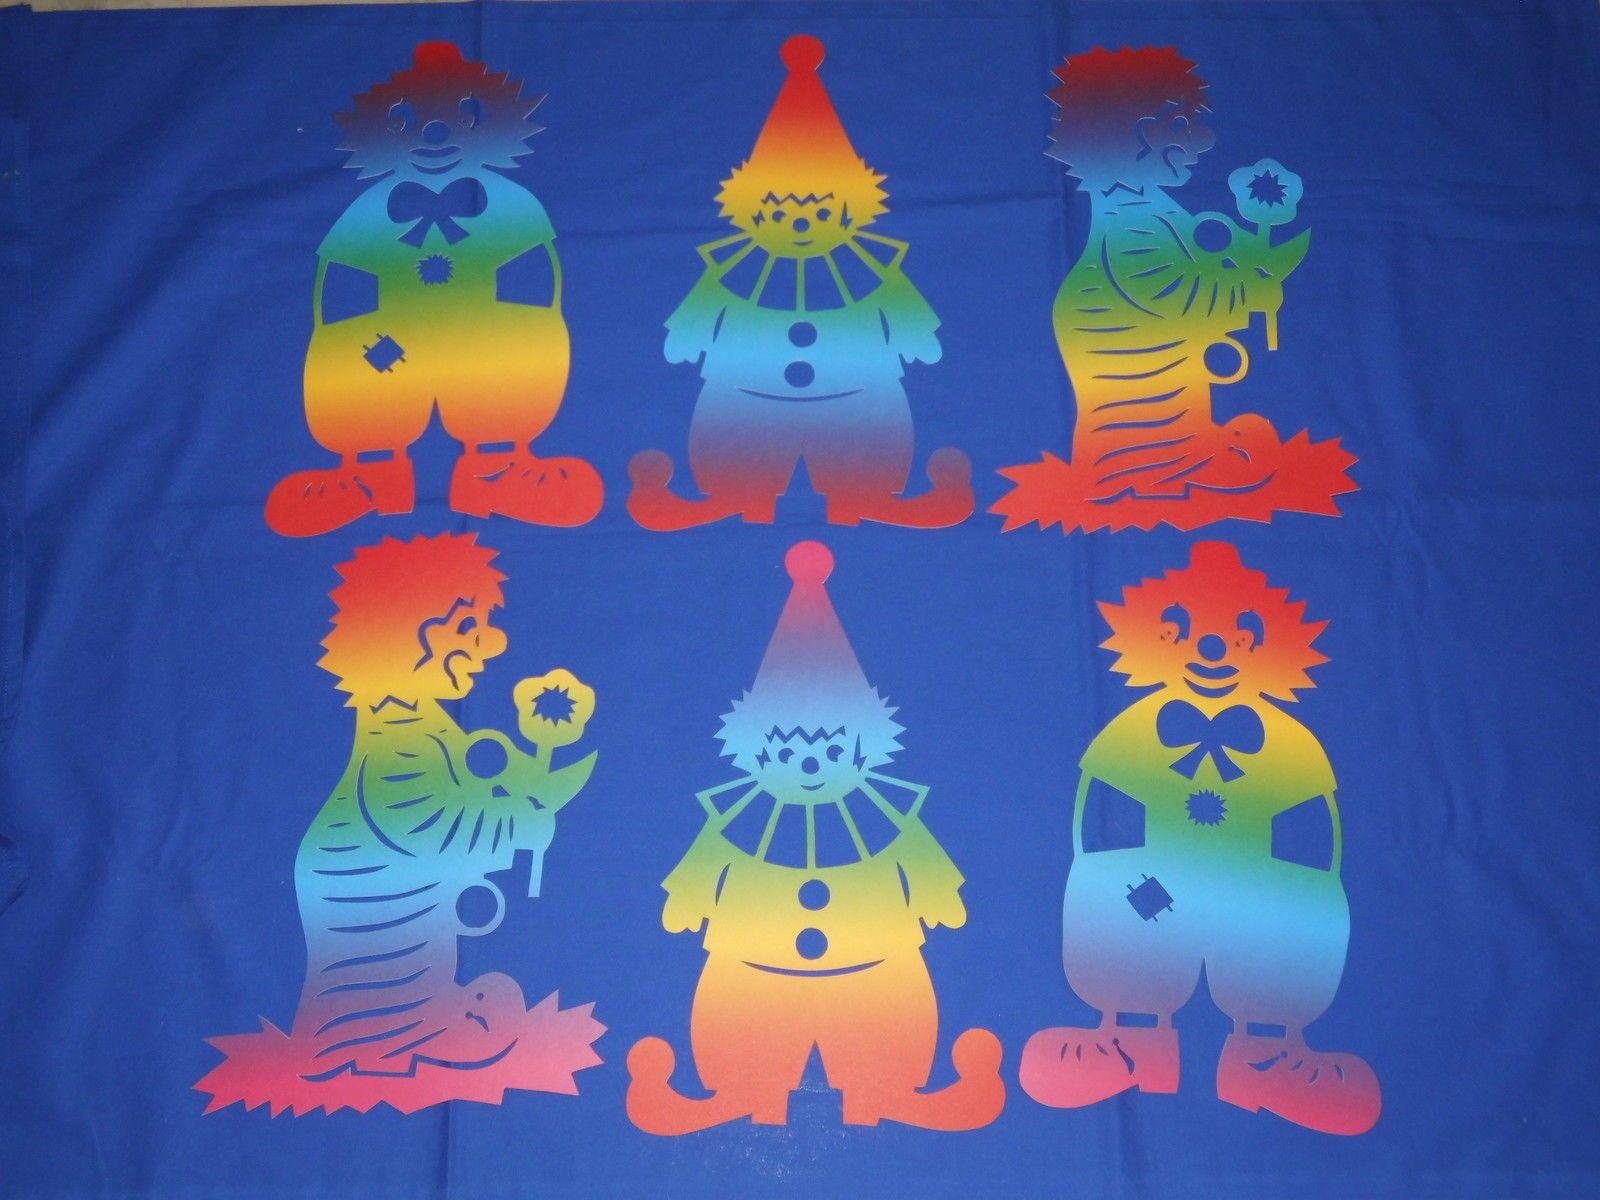 Fensterbilder tonkarton clown karneval fasching regenbogen 34 cm bunt neu fensterbilder - Fensterbilder karneval ...